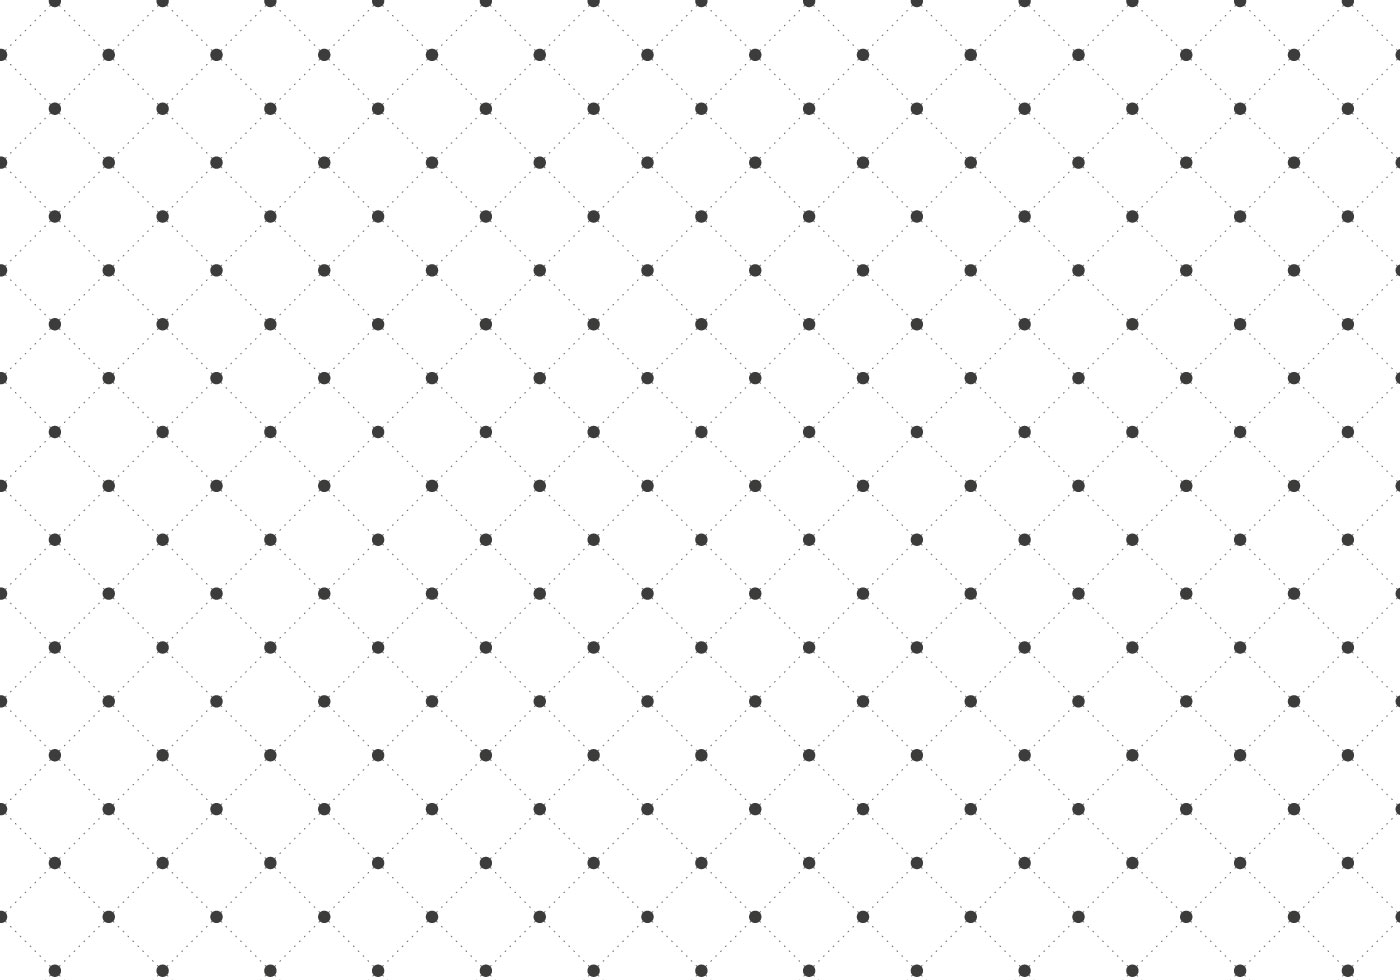 1400x980 Line Pattern Free Vector Art 18,000 Free Line Pattern Files!